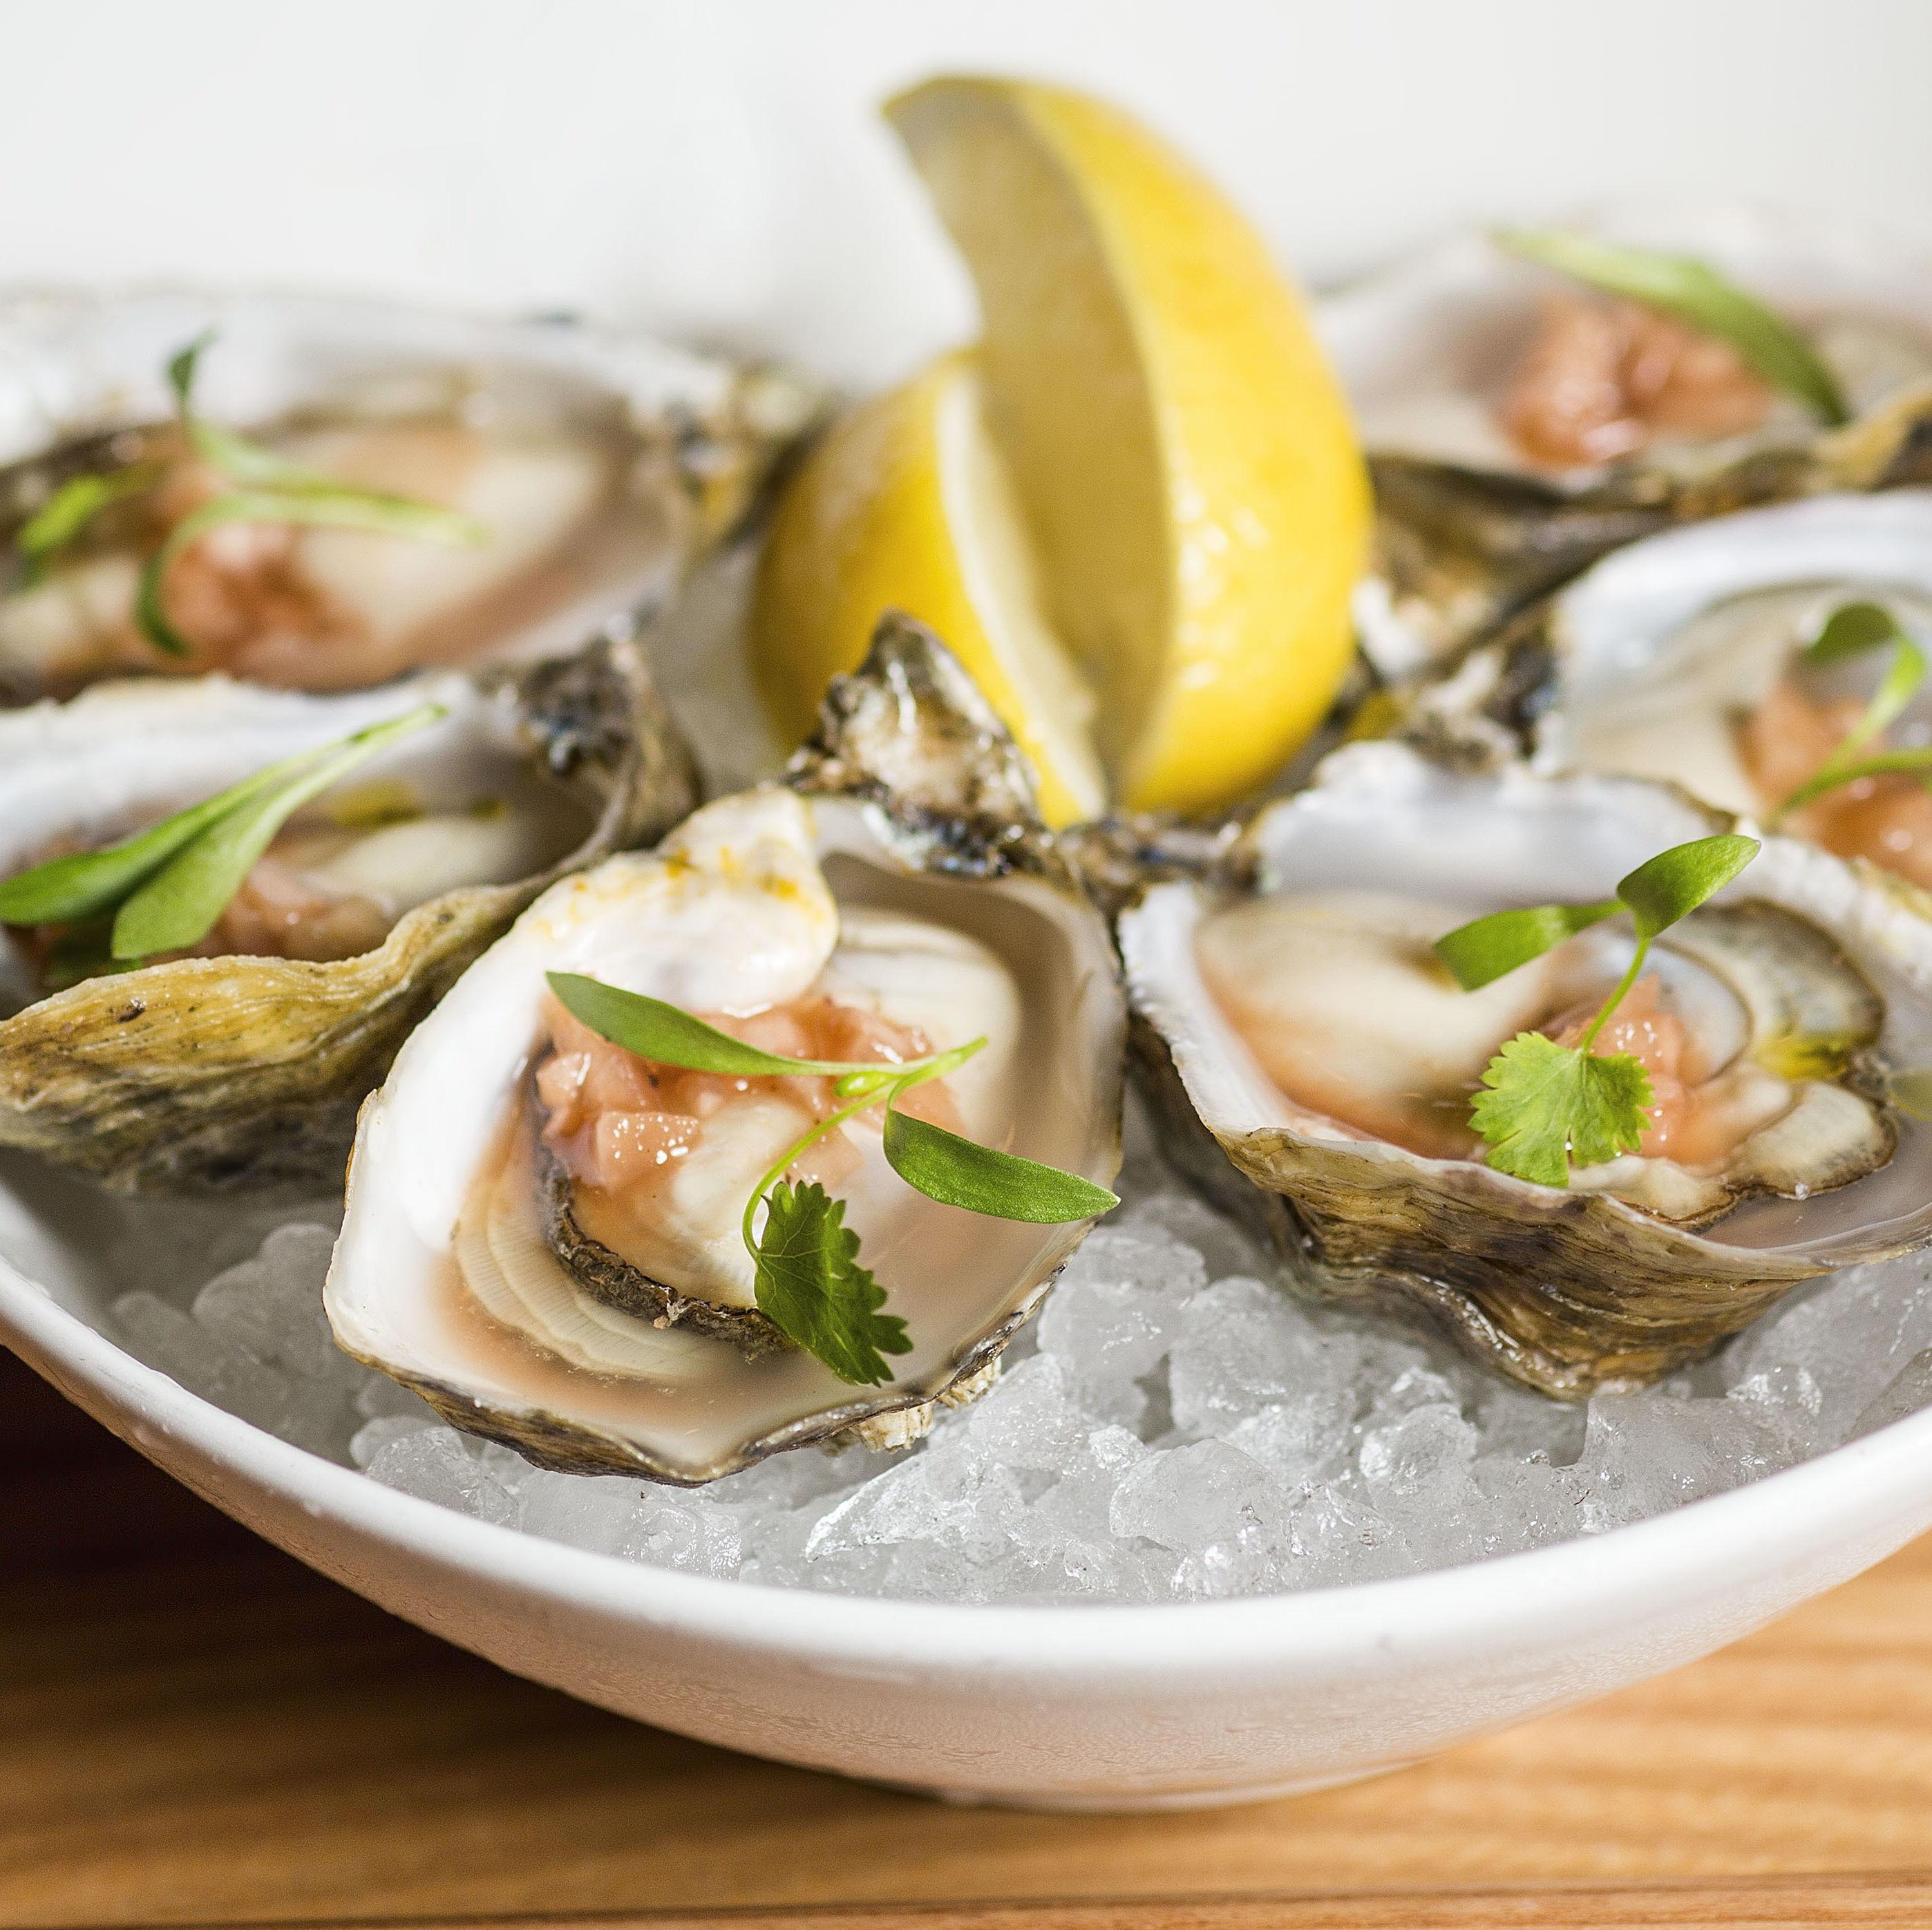 Kusshi oysters hix5b1